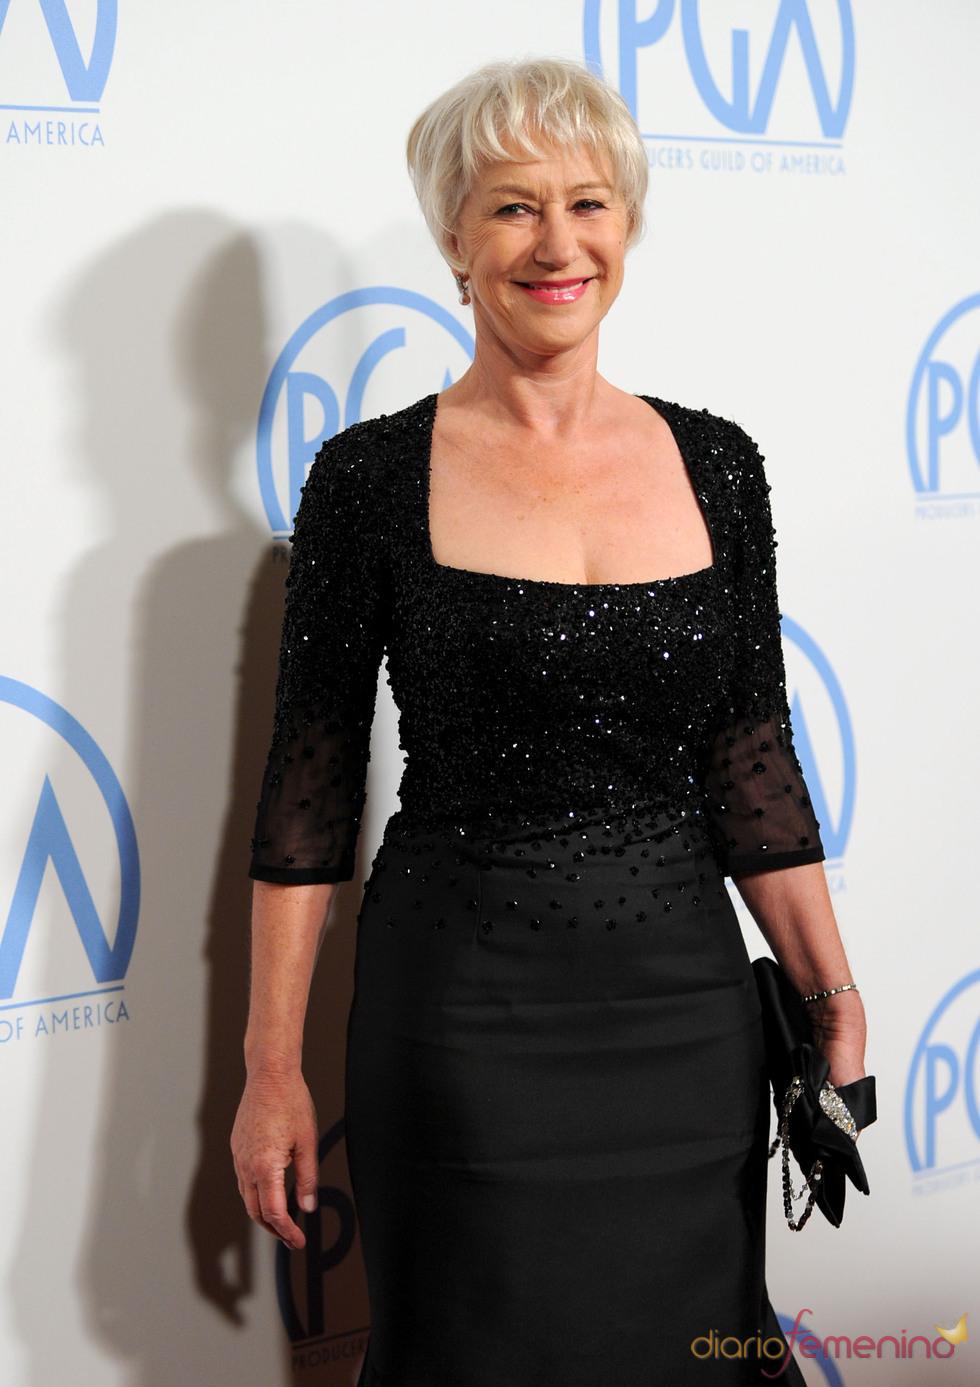 Helen Mirren en los Annual Producers Guild Awards 2011